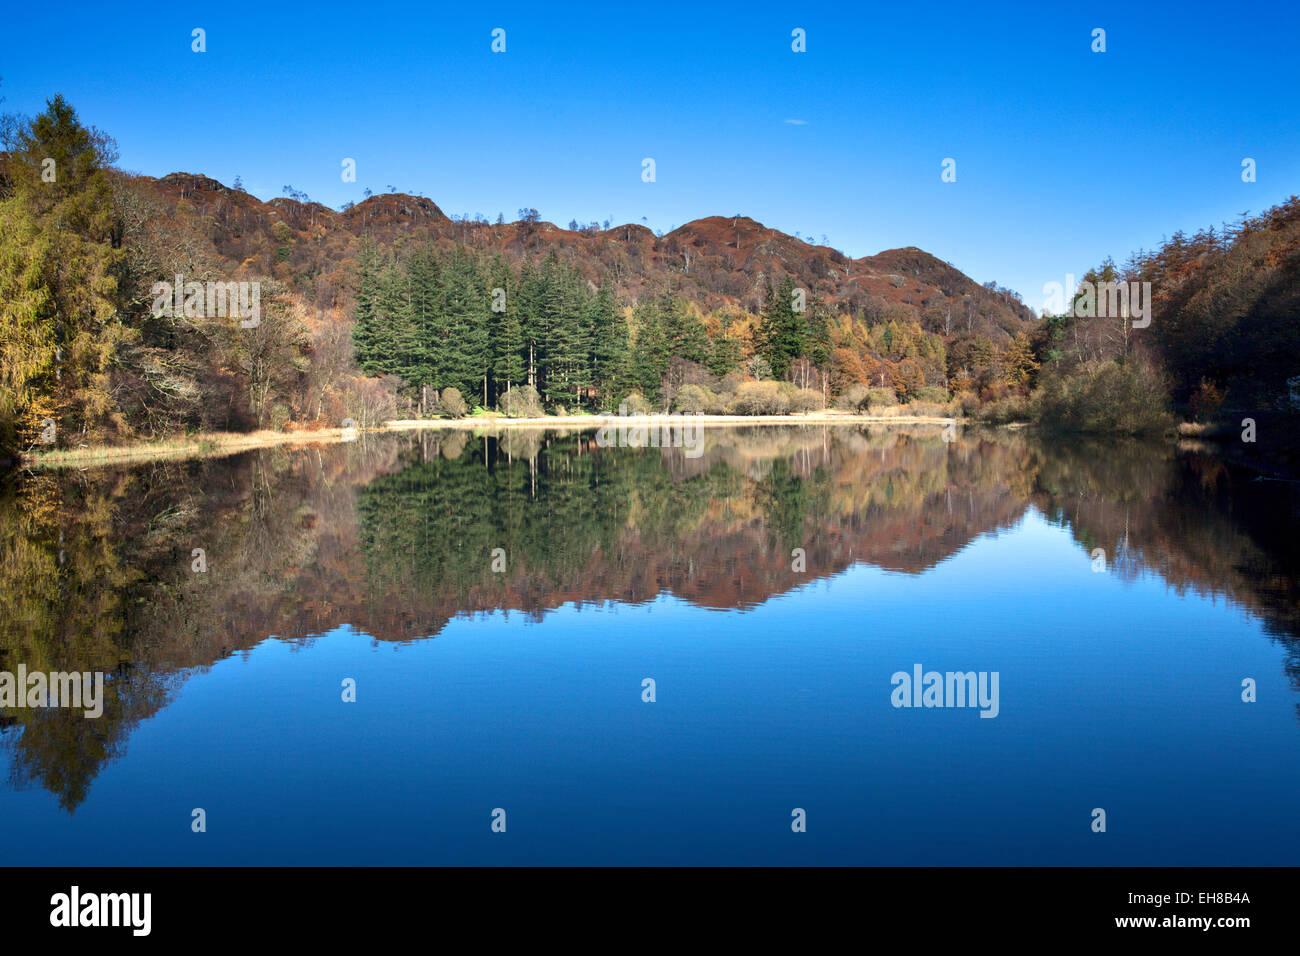 Yew Tree Tarn on a sunny autumn day, Lake District National Park, Cumbria, England, United Kingdom, Europe - Stock Image